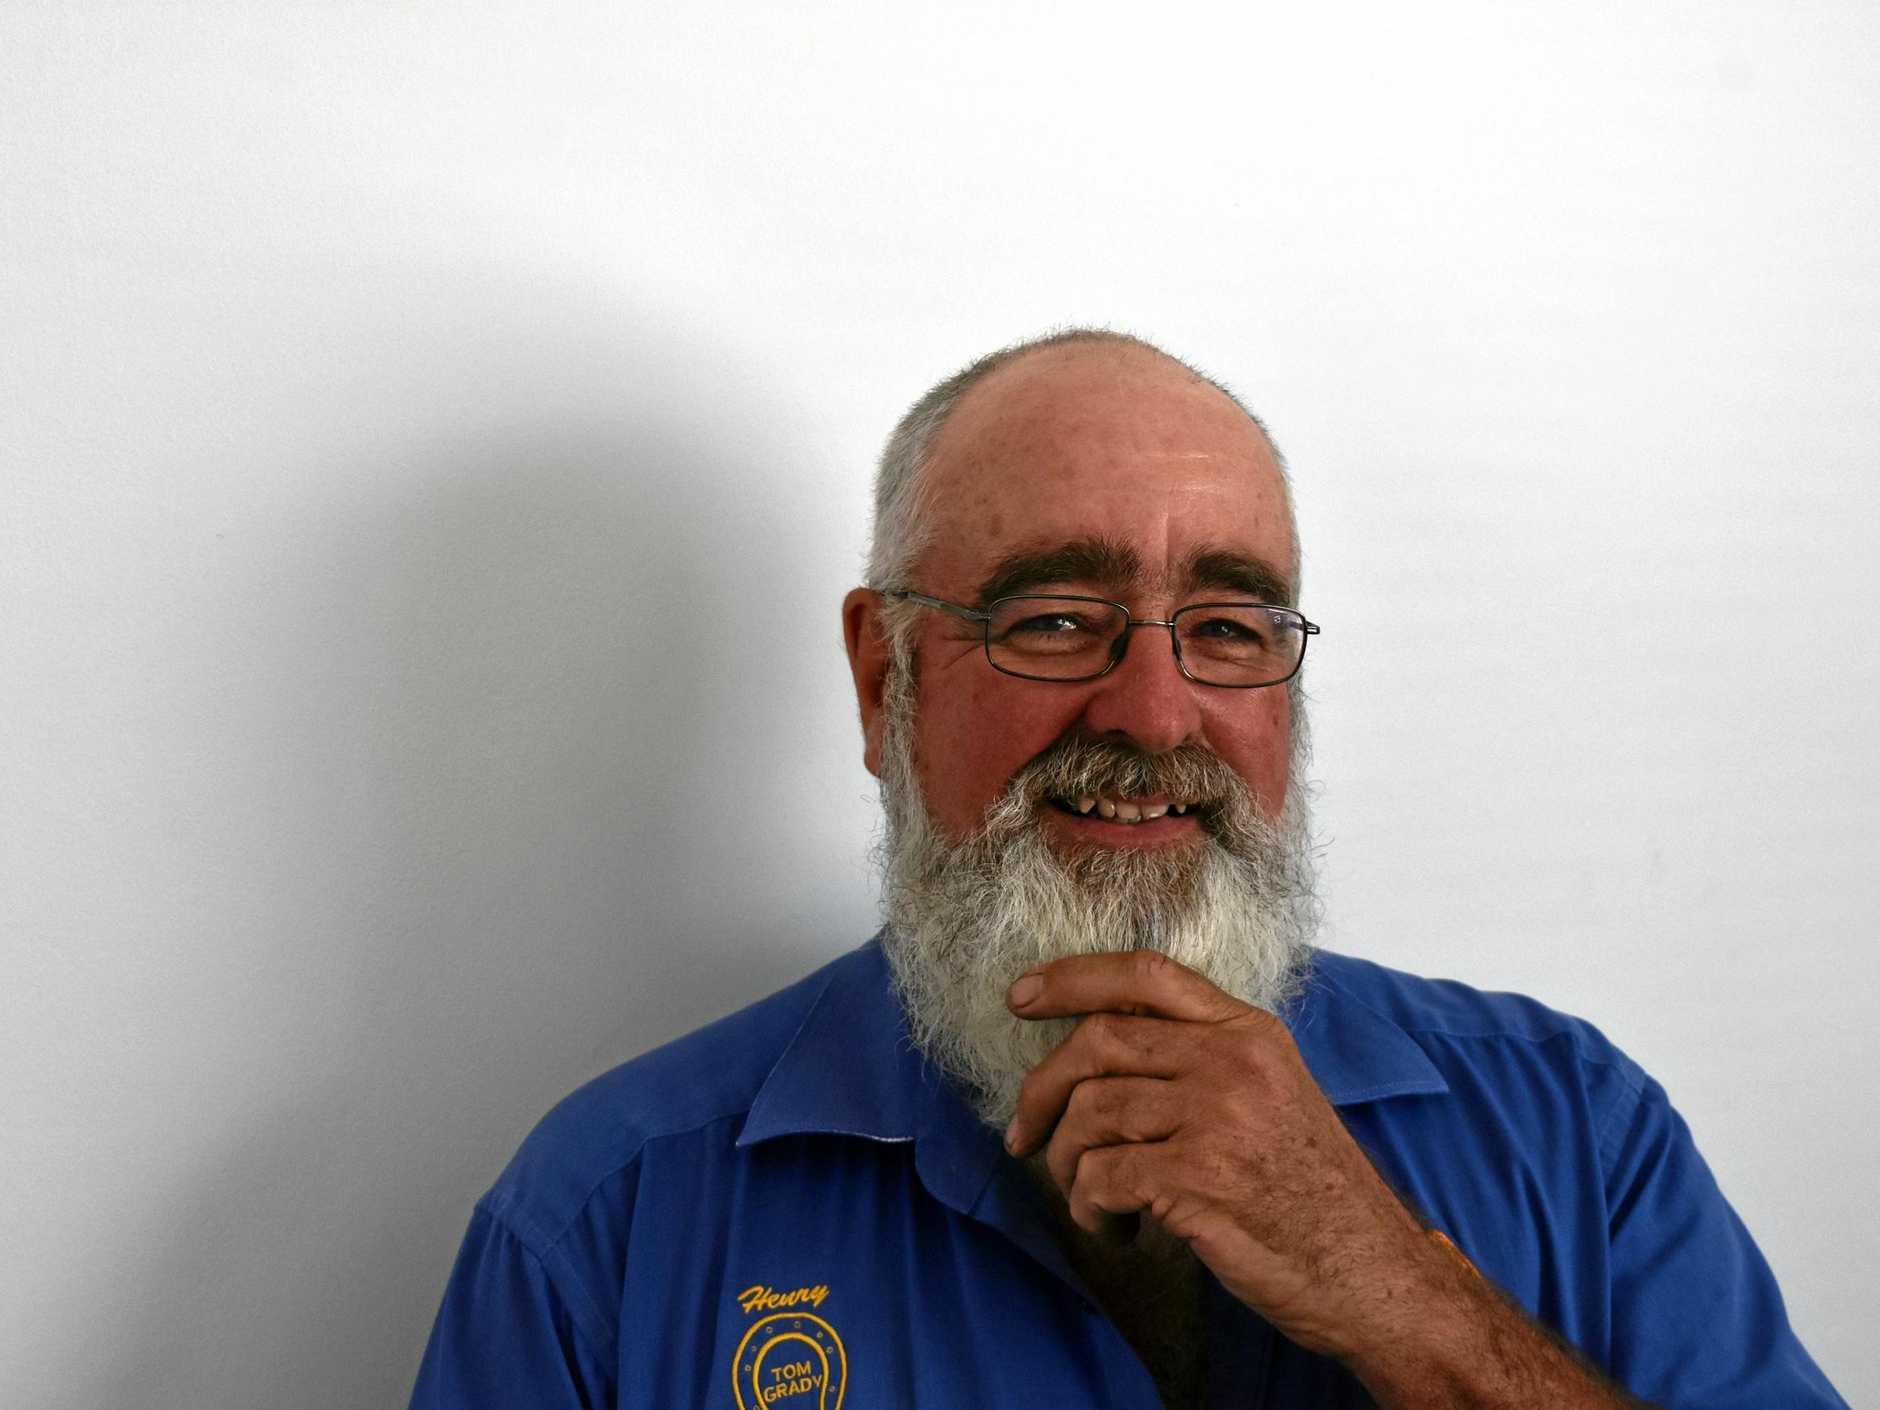 Henry Lowe will judge the Gold Rush Festival's Big Beard Bonanza.